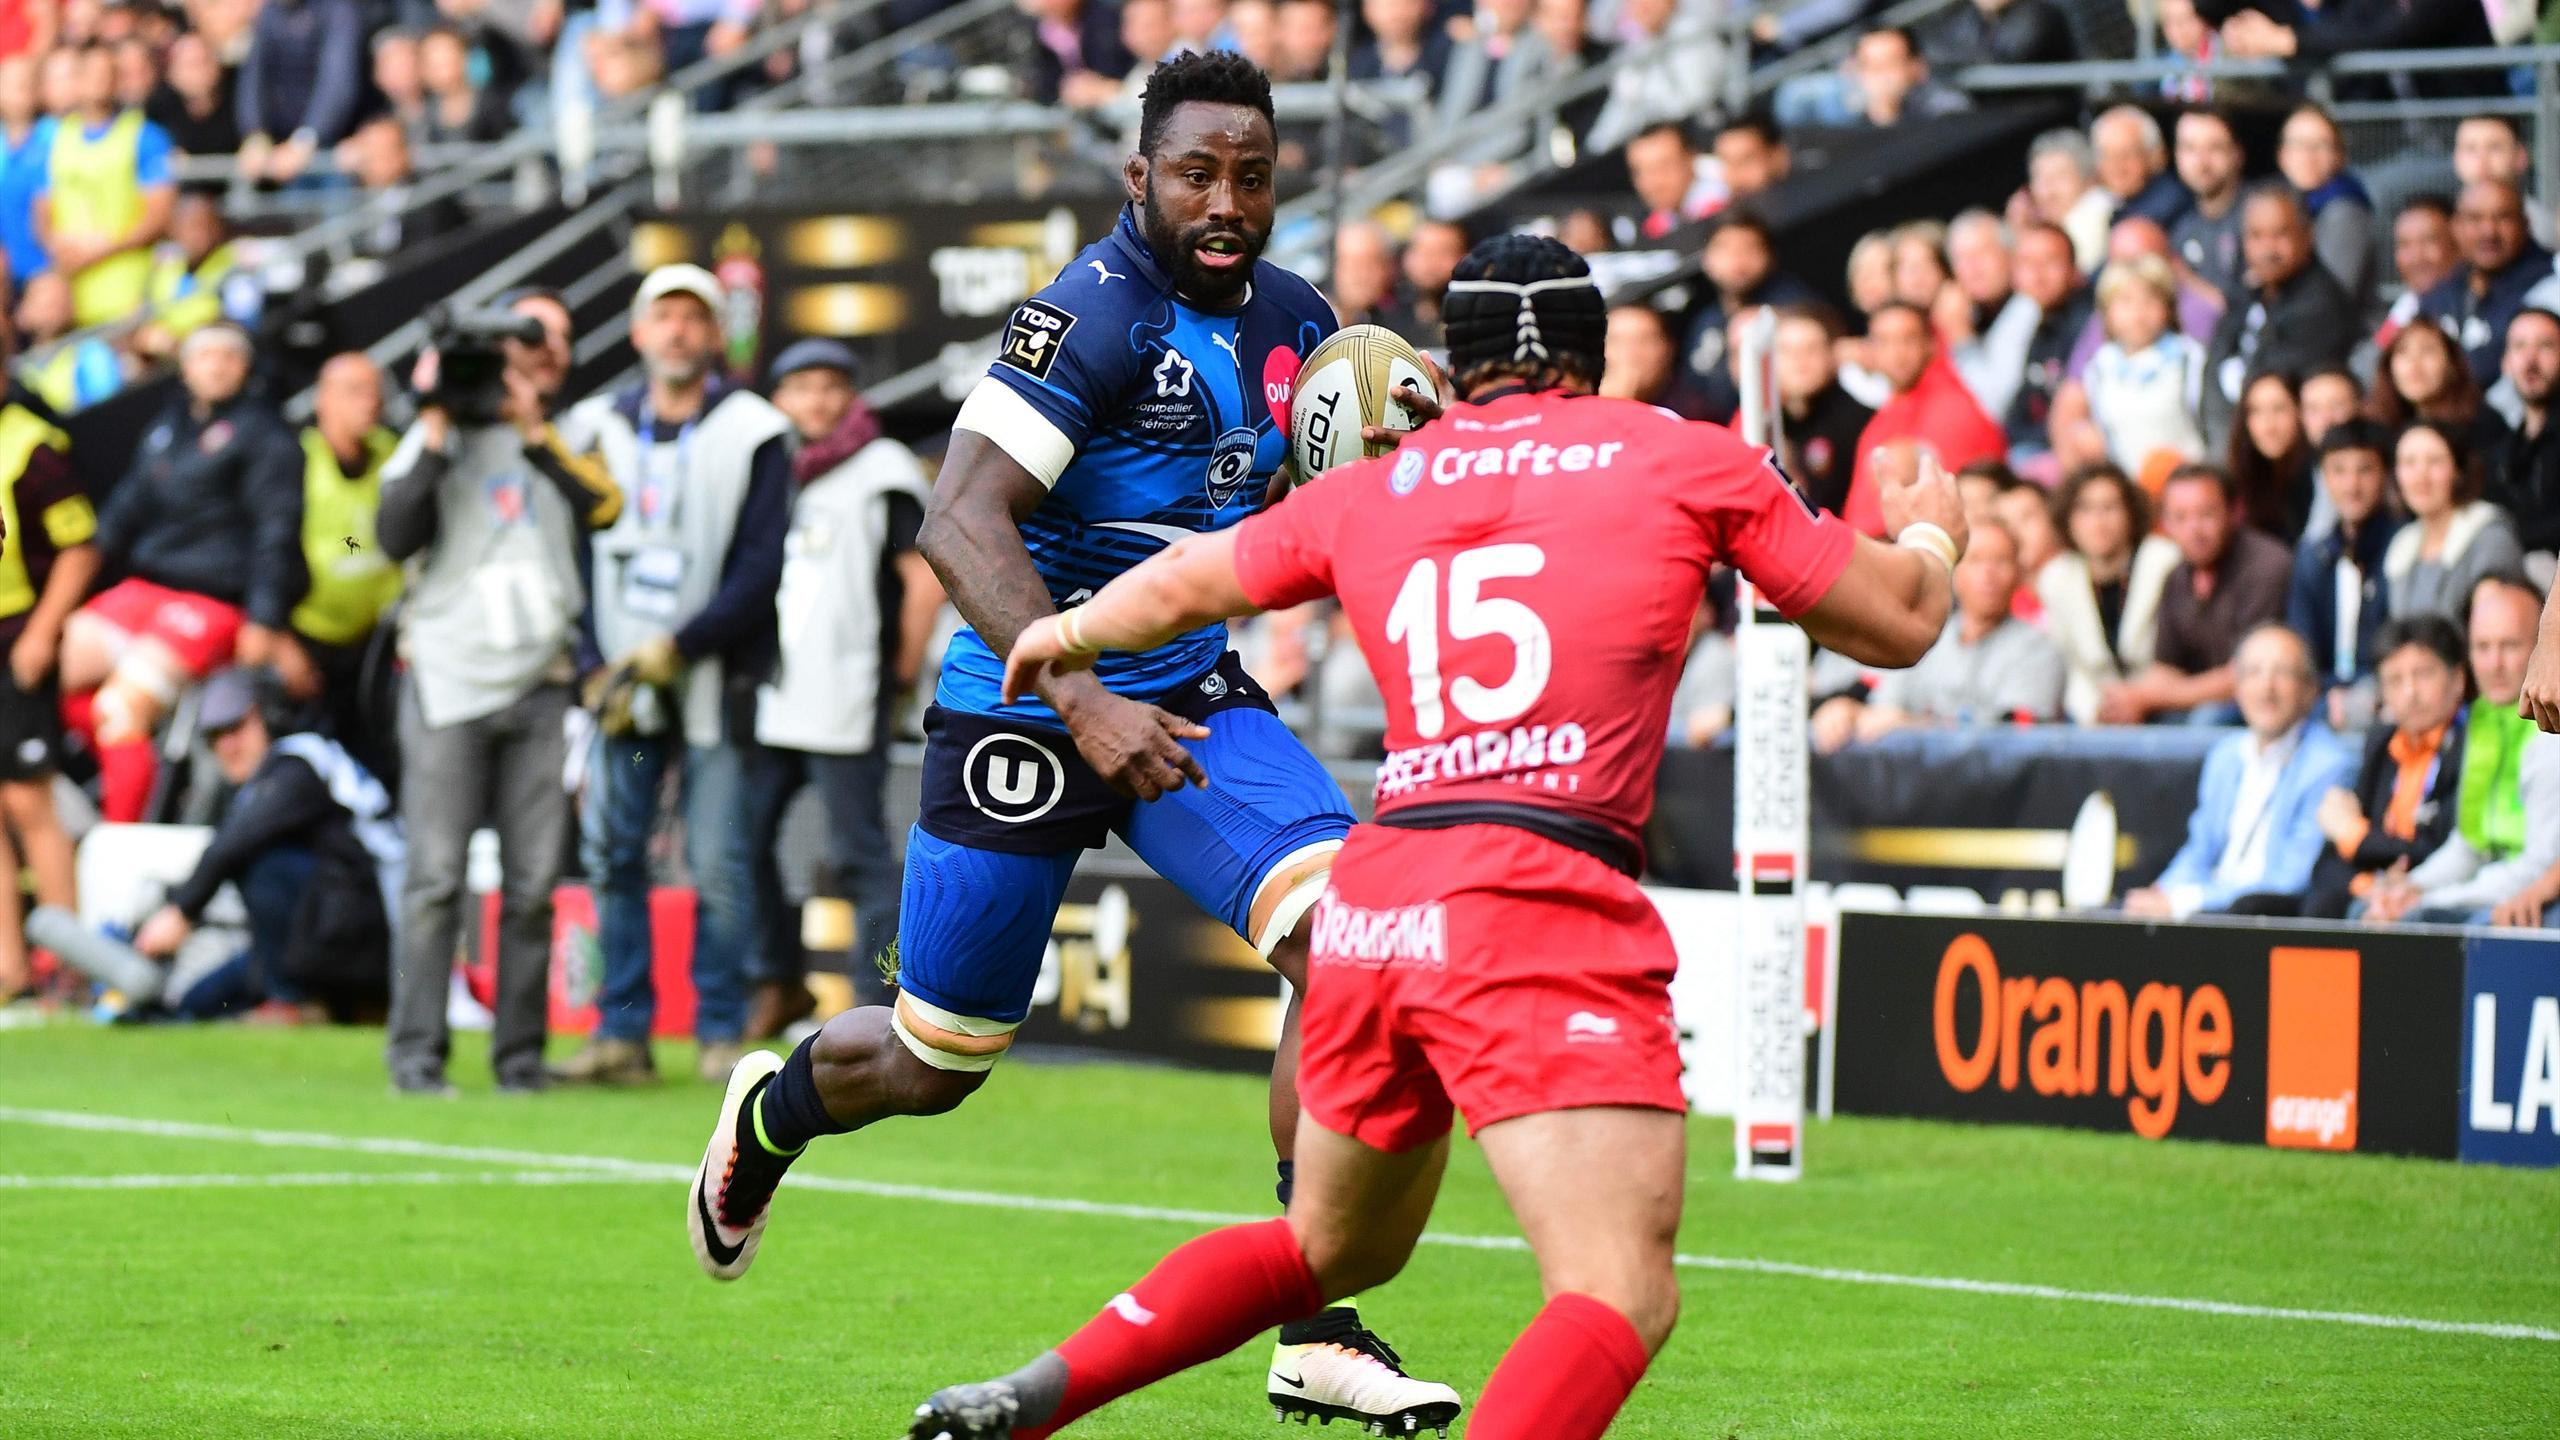 Fulgence Ouedraogo (Montpellier) face à Toulon - 18 juin 2016